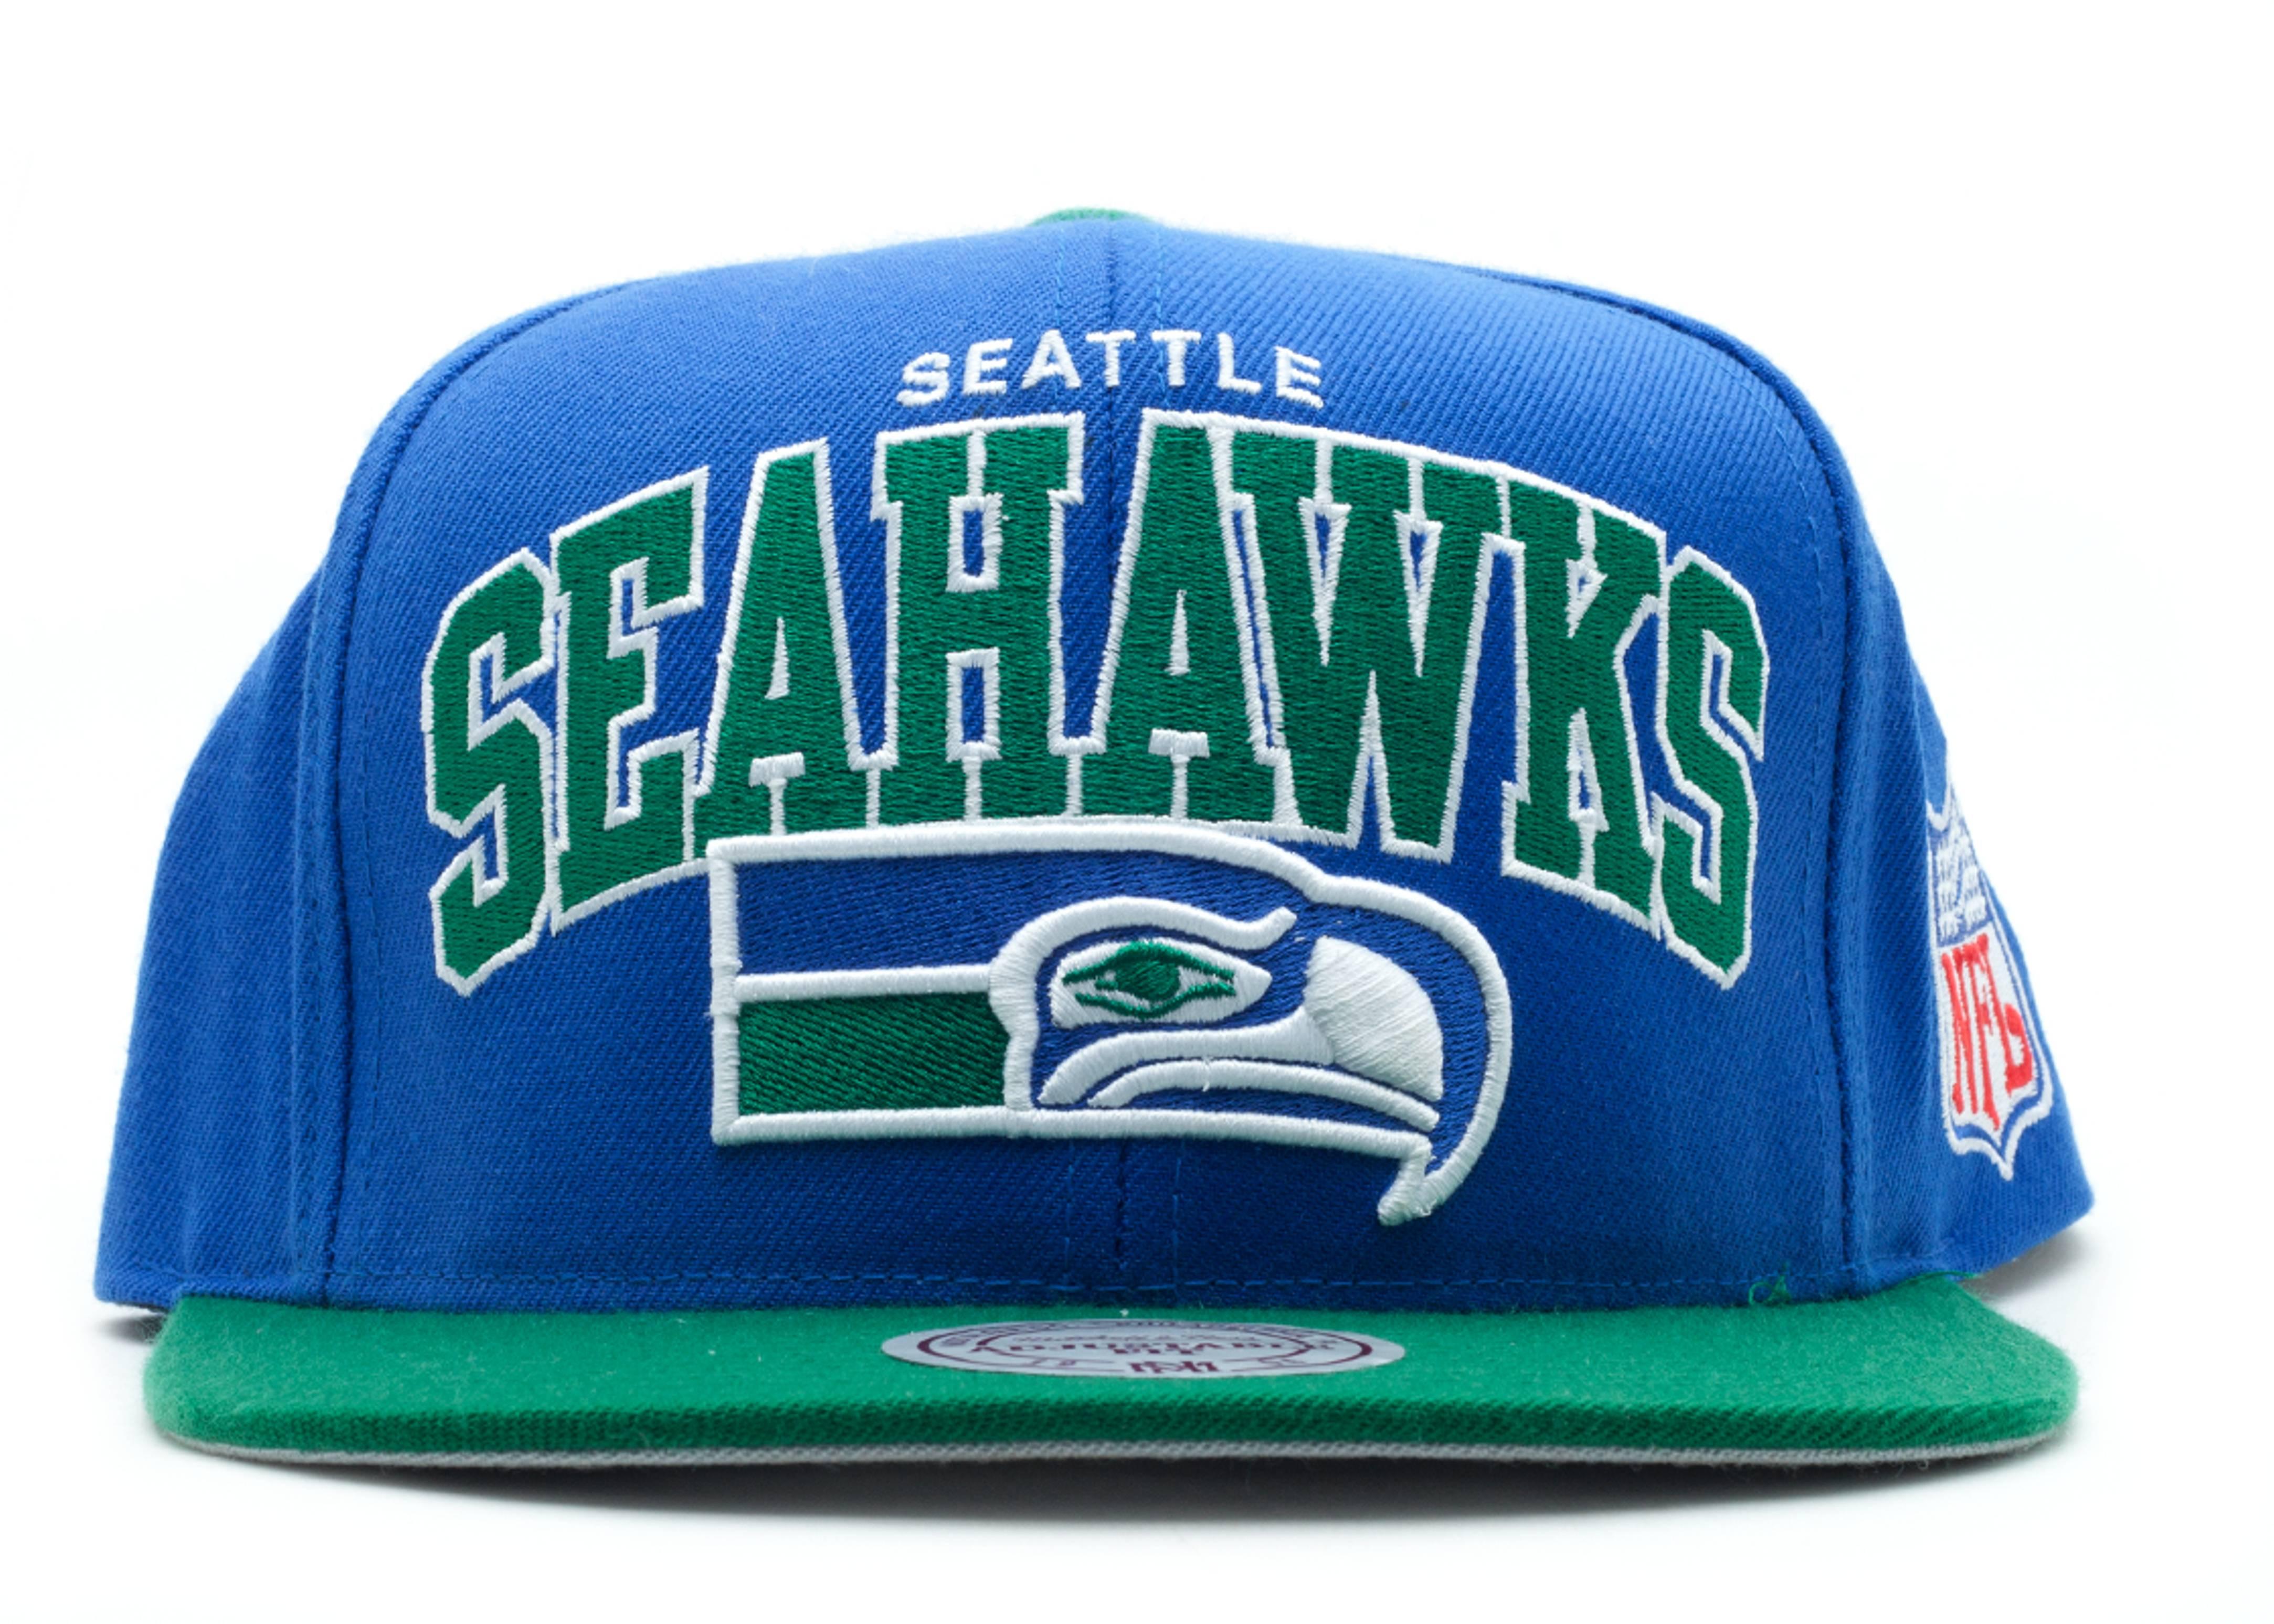 seattl-e seahawks snap-back